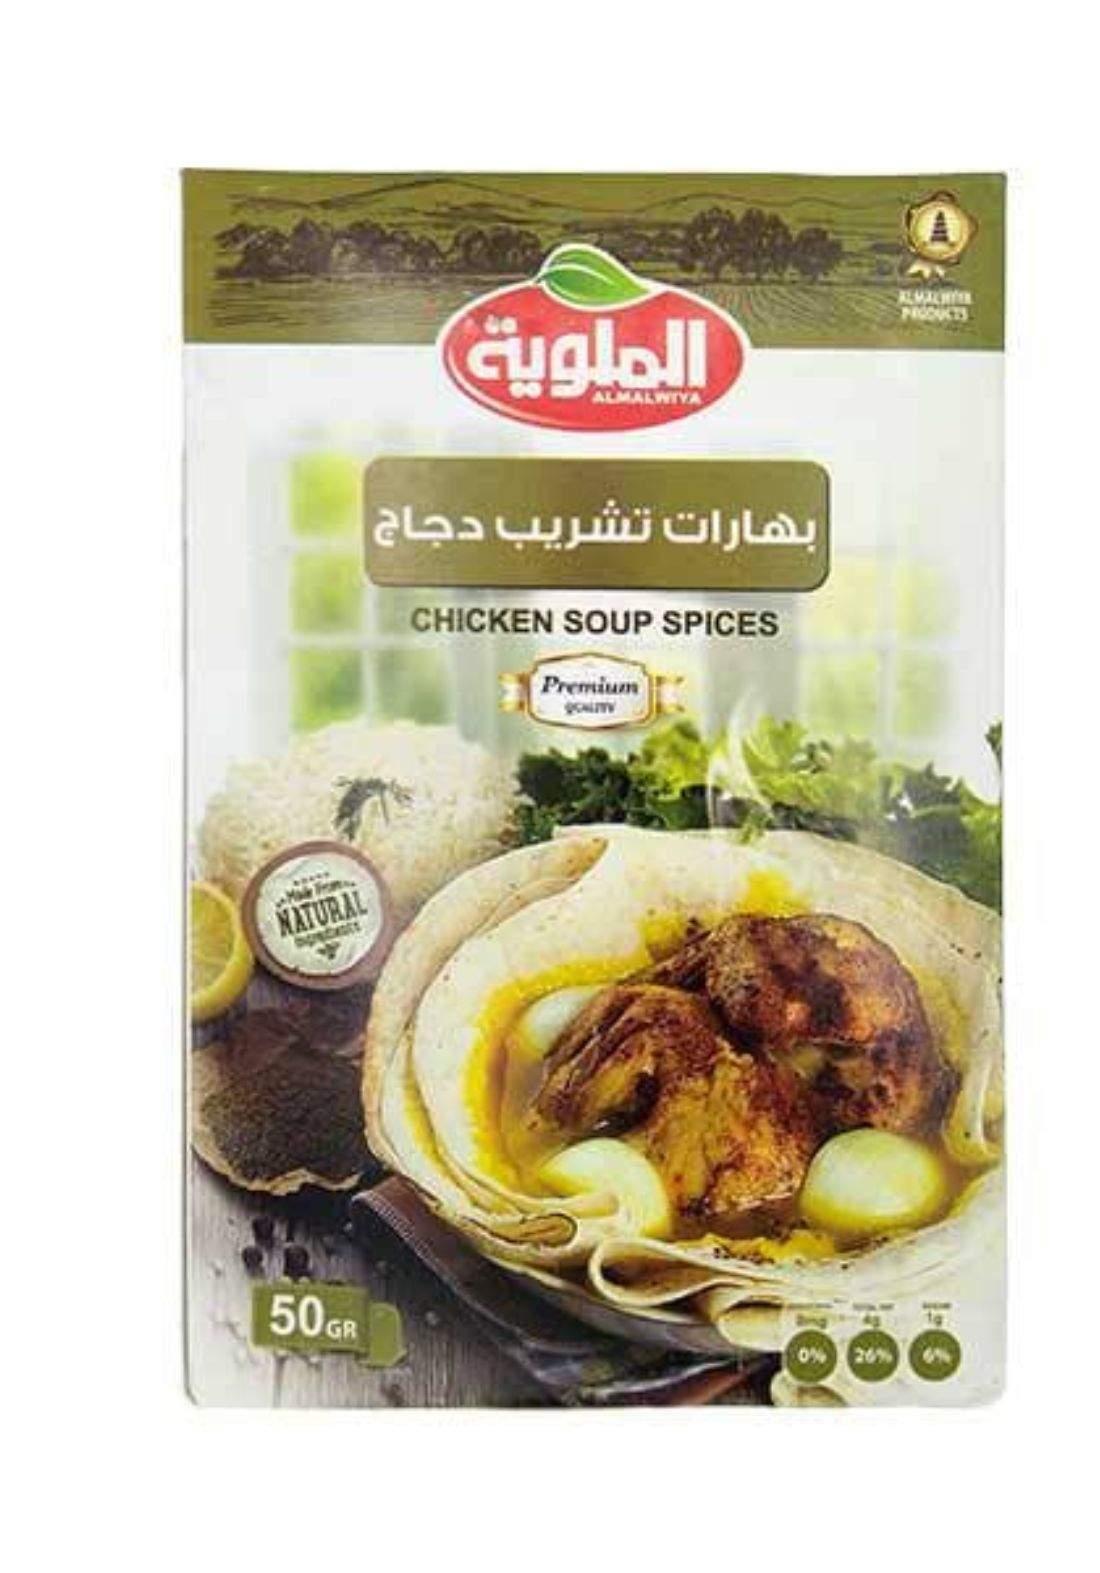 Chicken soup spices 50g الملوية بهارات تشريب دجاج